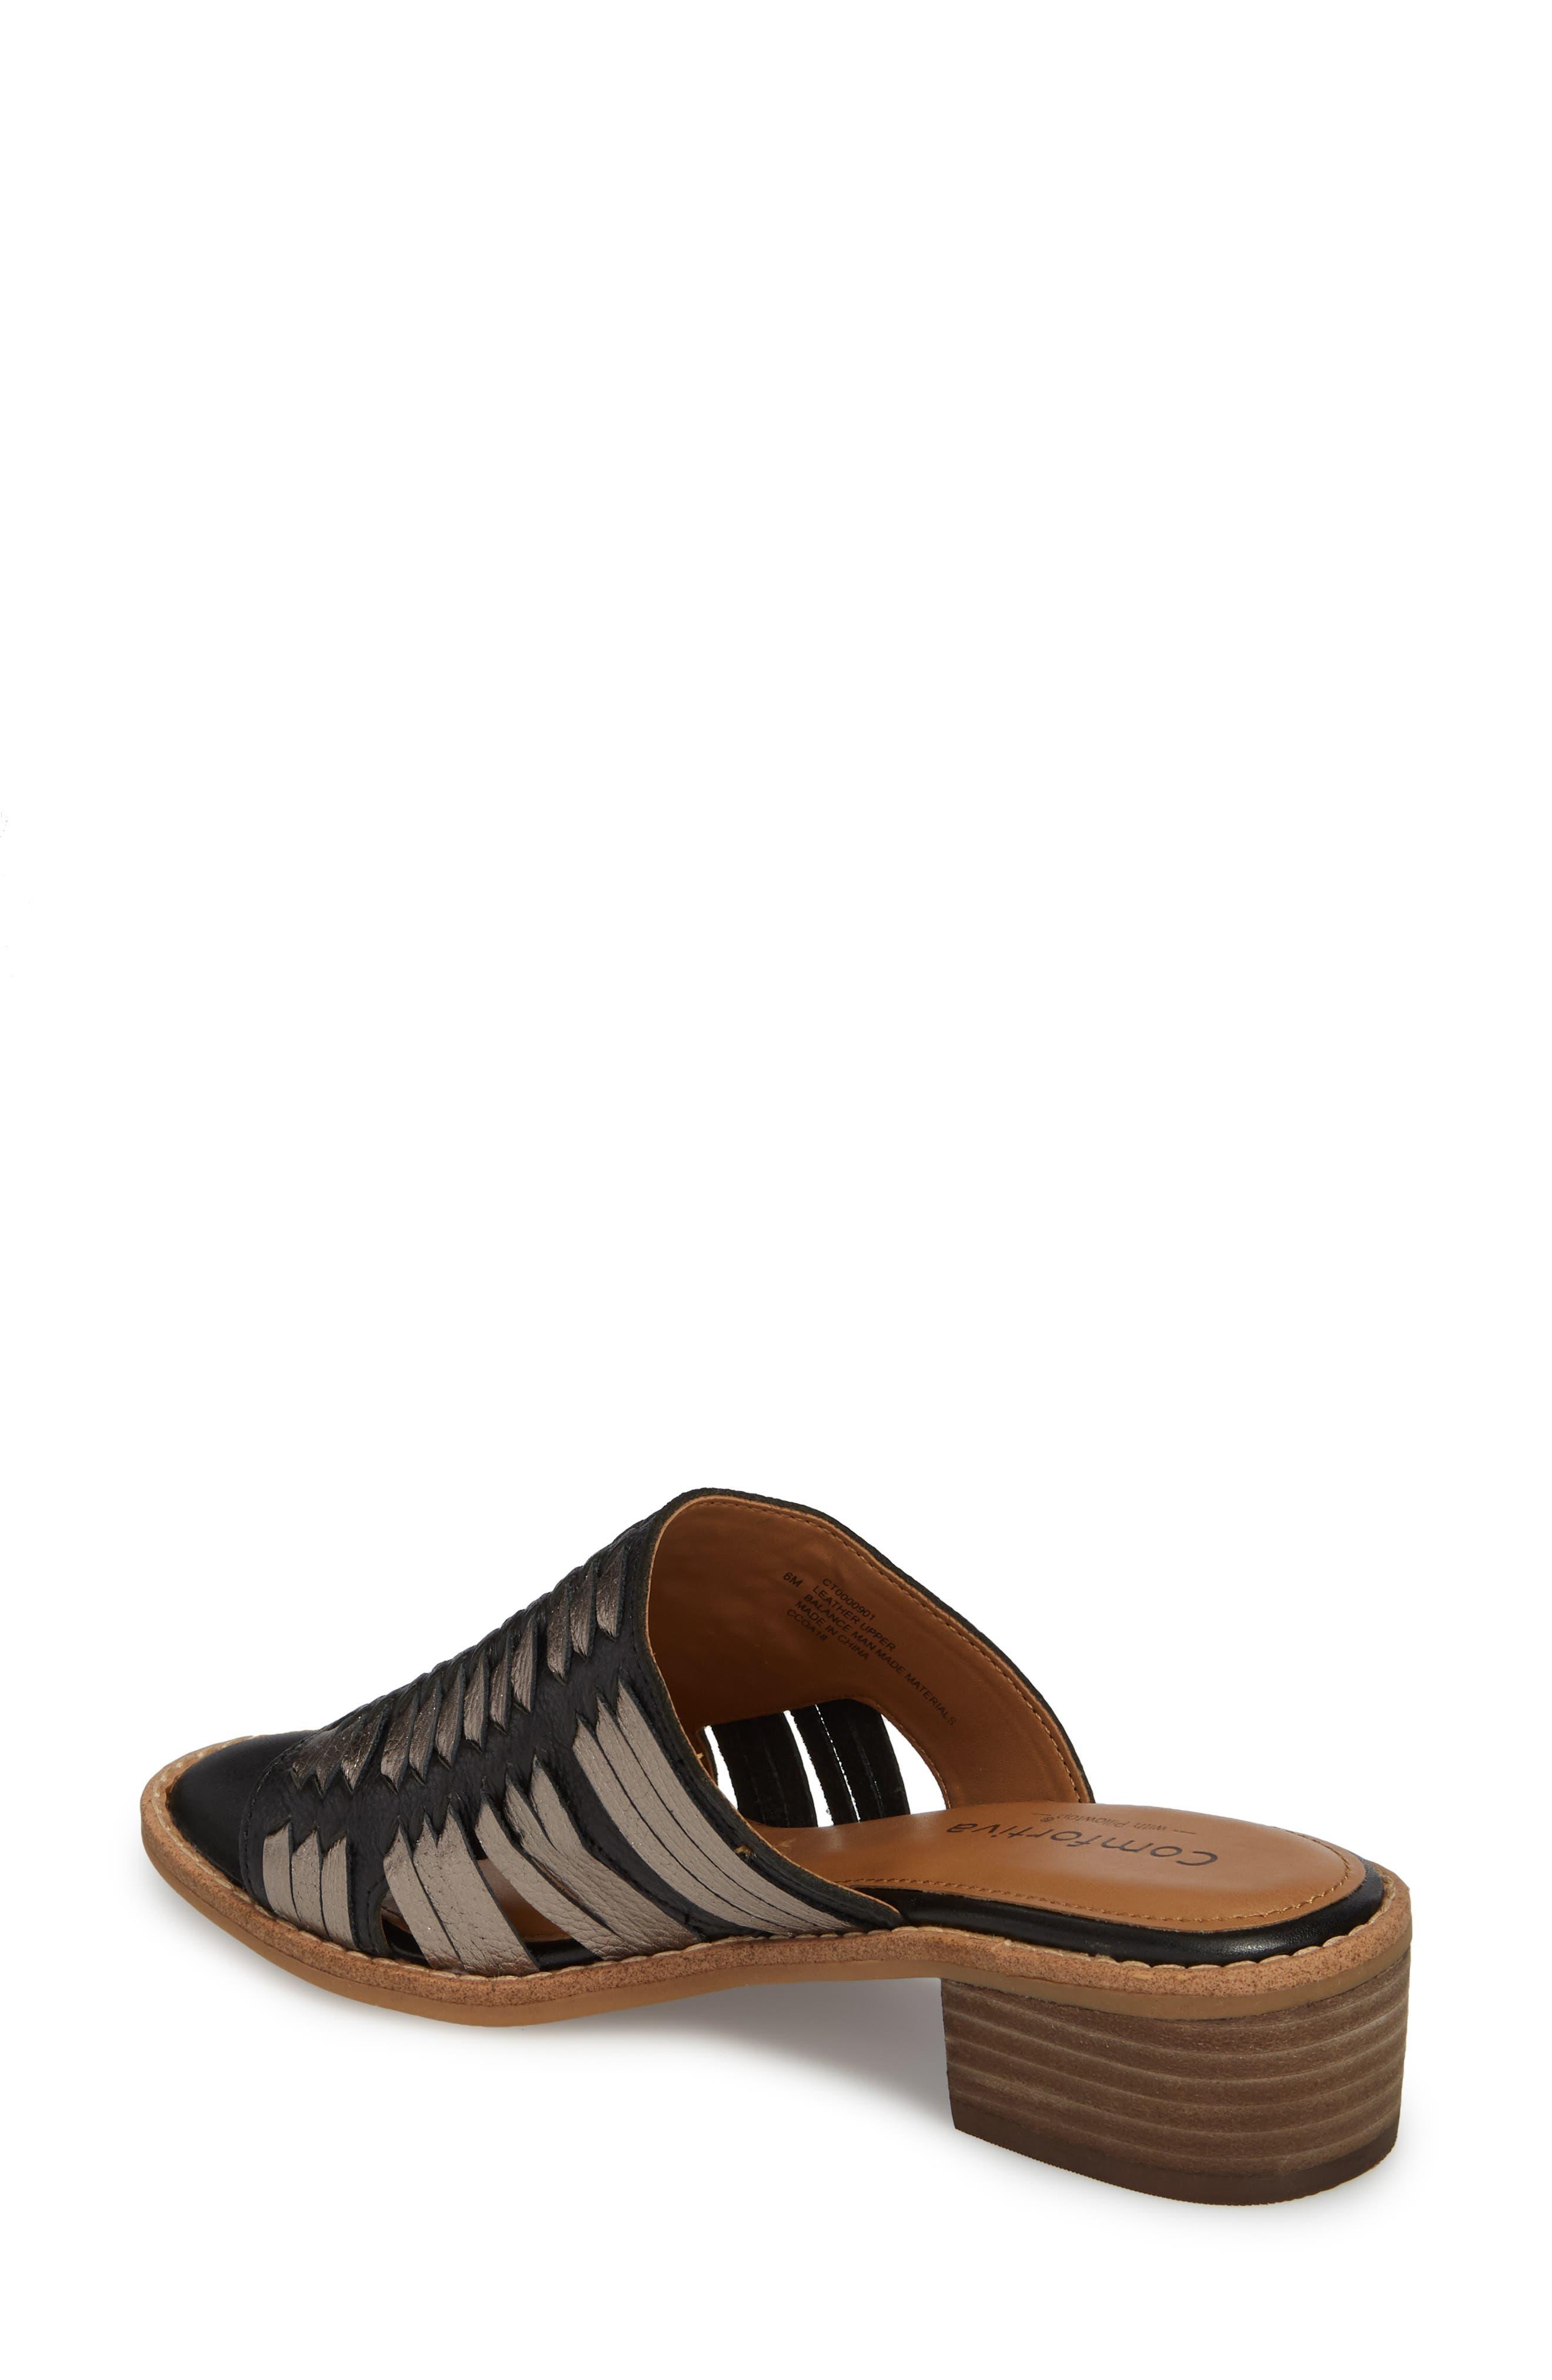 Brileigh Slide Sandal,                             Alternate thumbnail 2, color,                             Black Leather